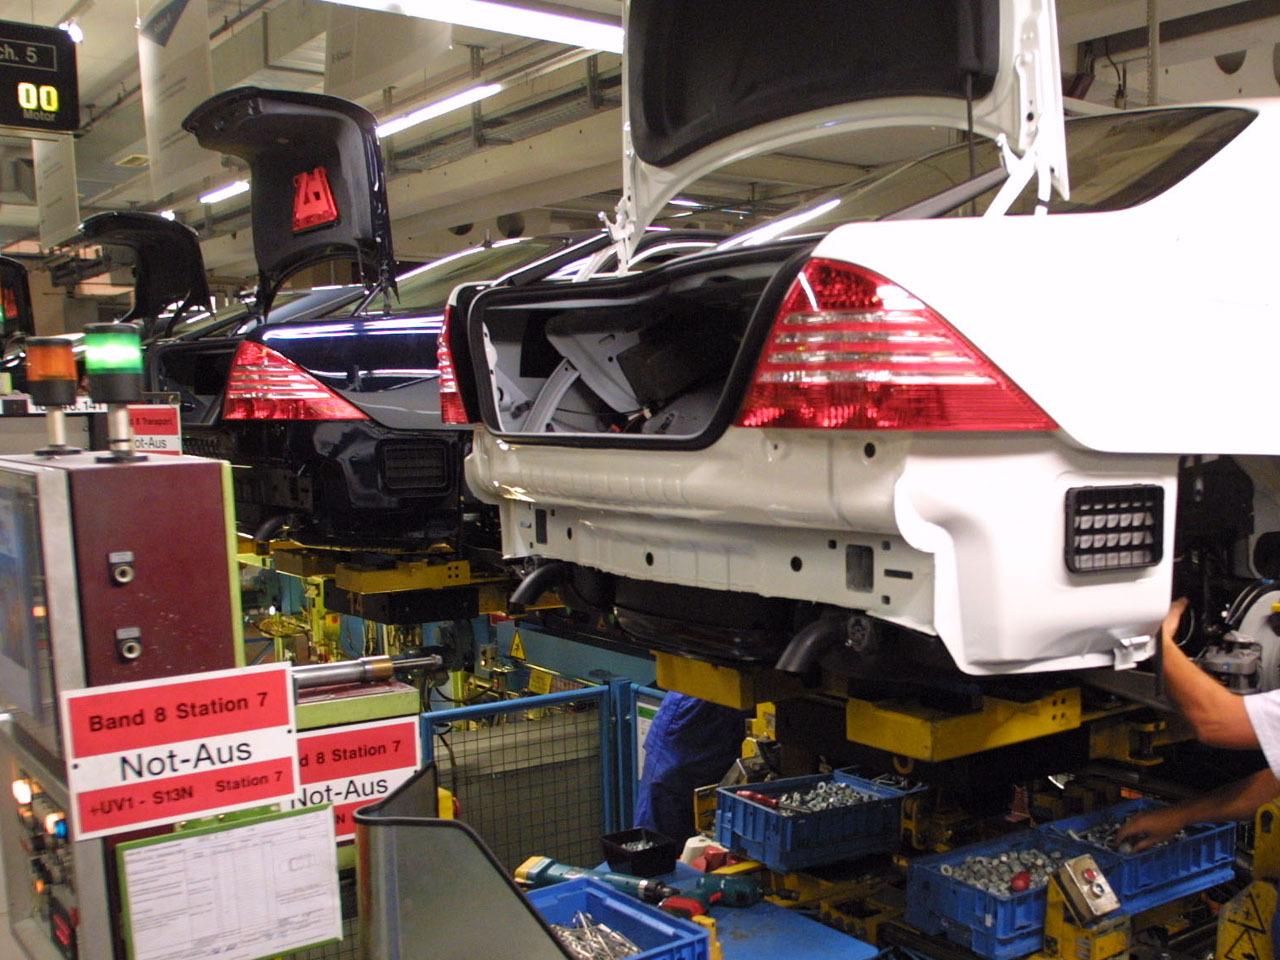 U S  probes C-Class Mercedes for lighting problems - CBS News